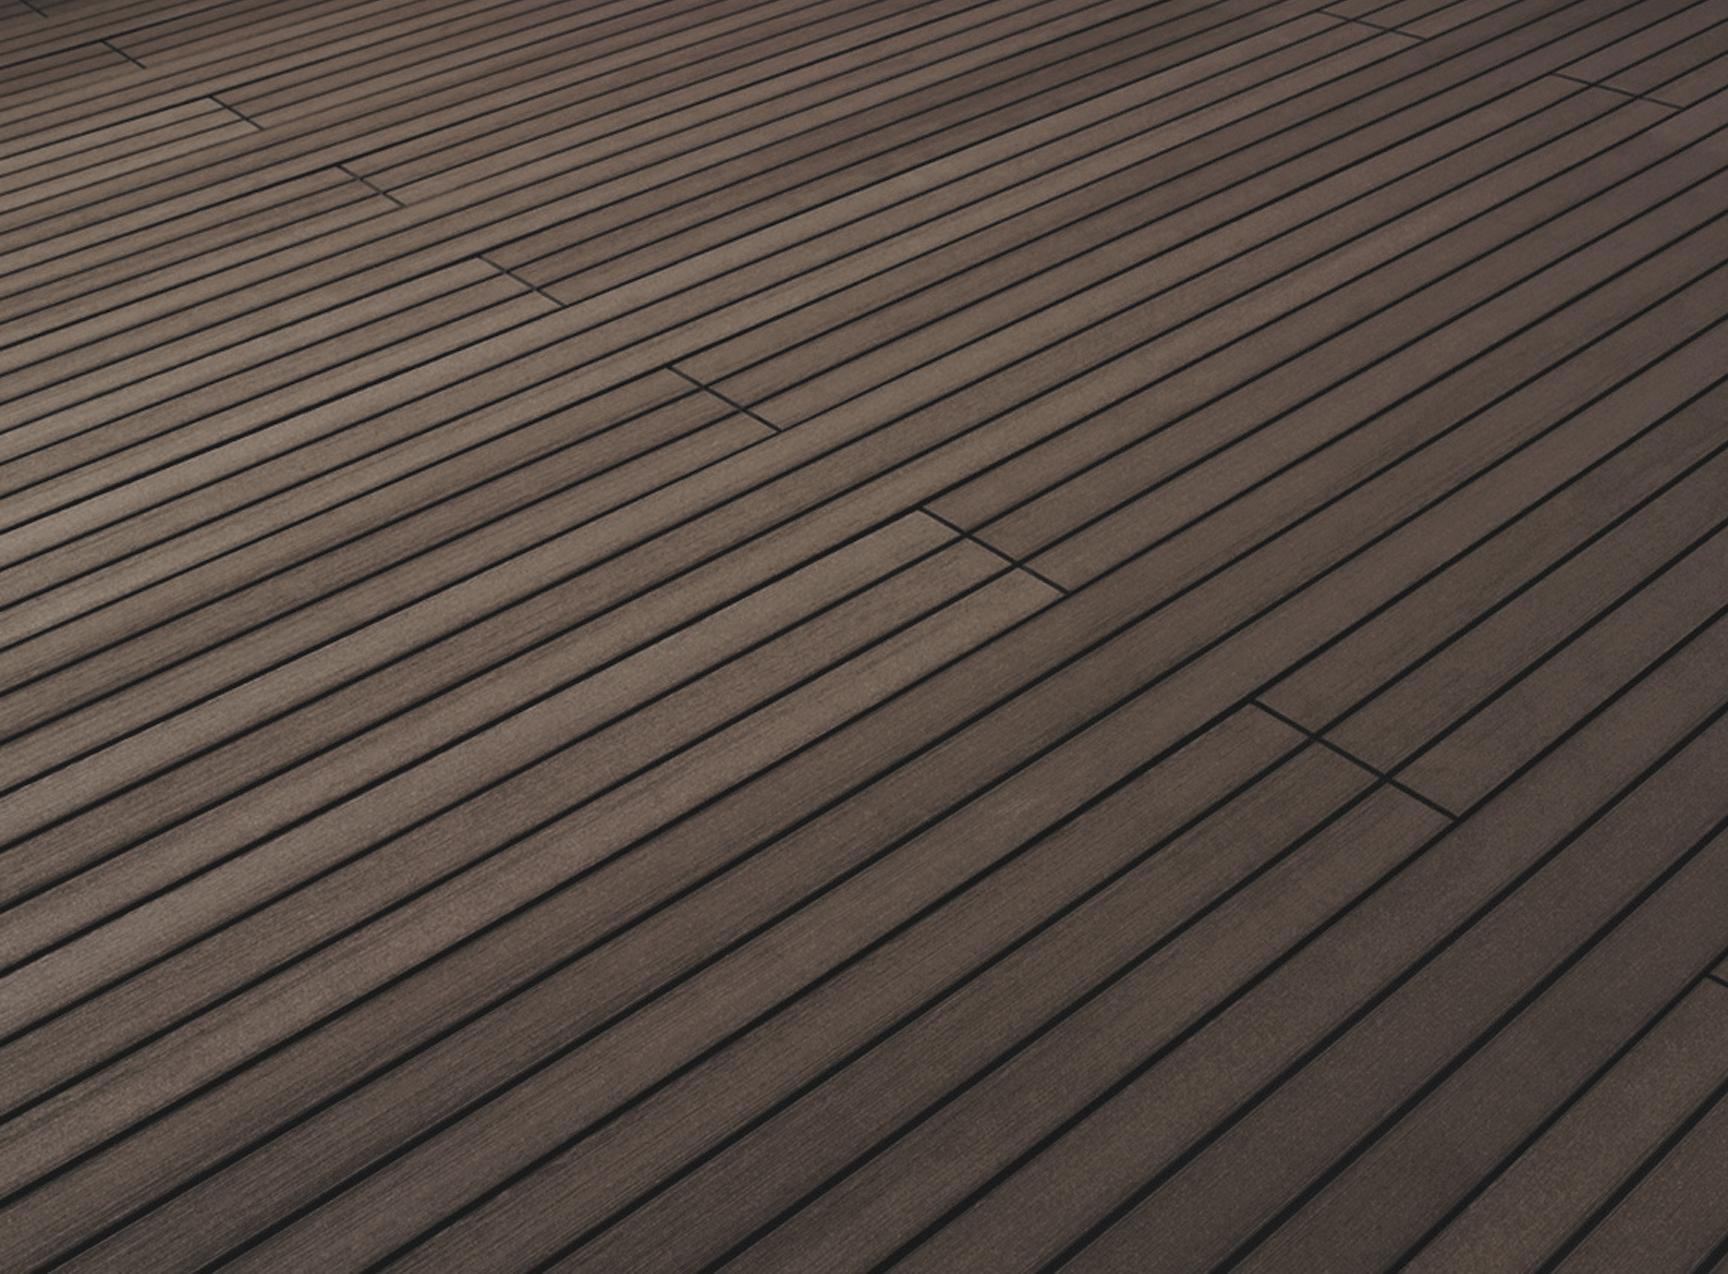 Terrafina composite decking yacht redbrown surface finish